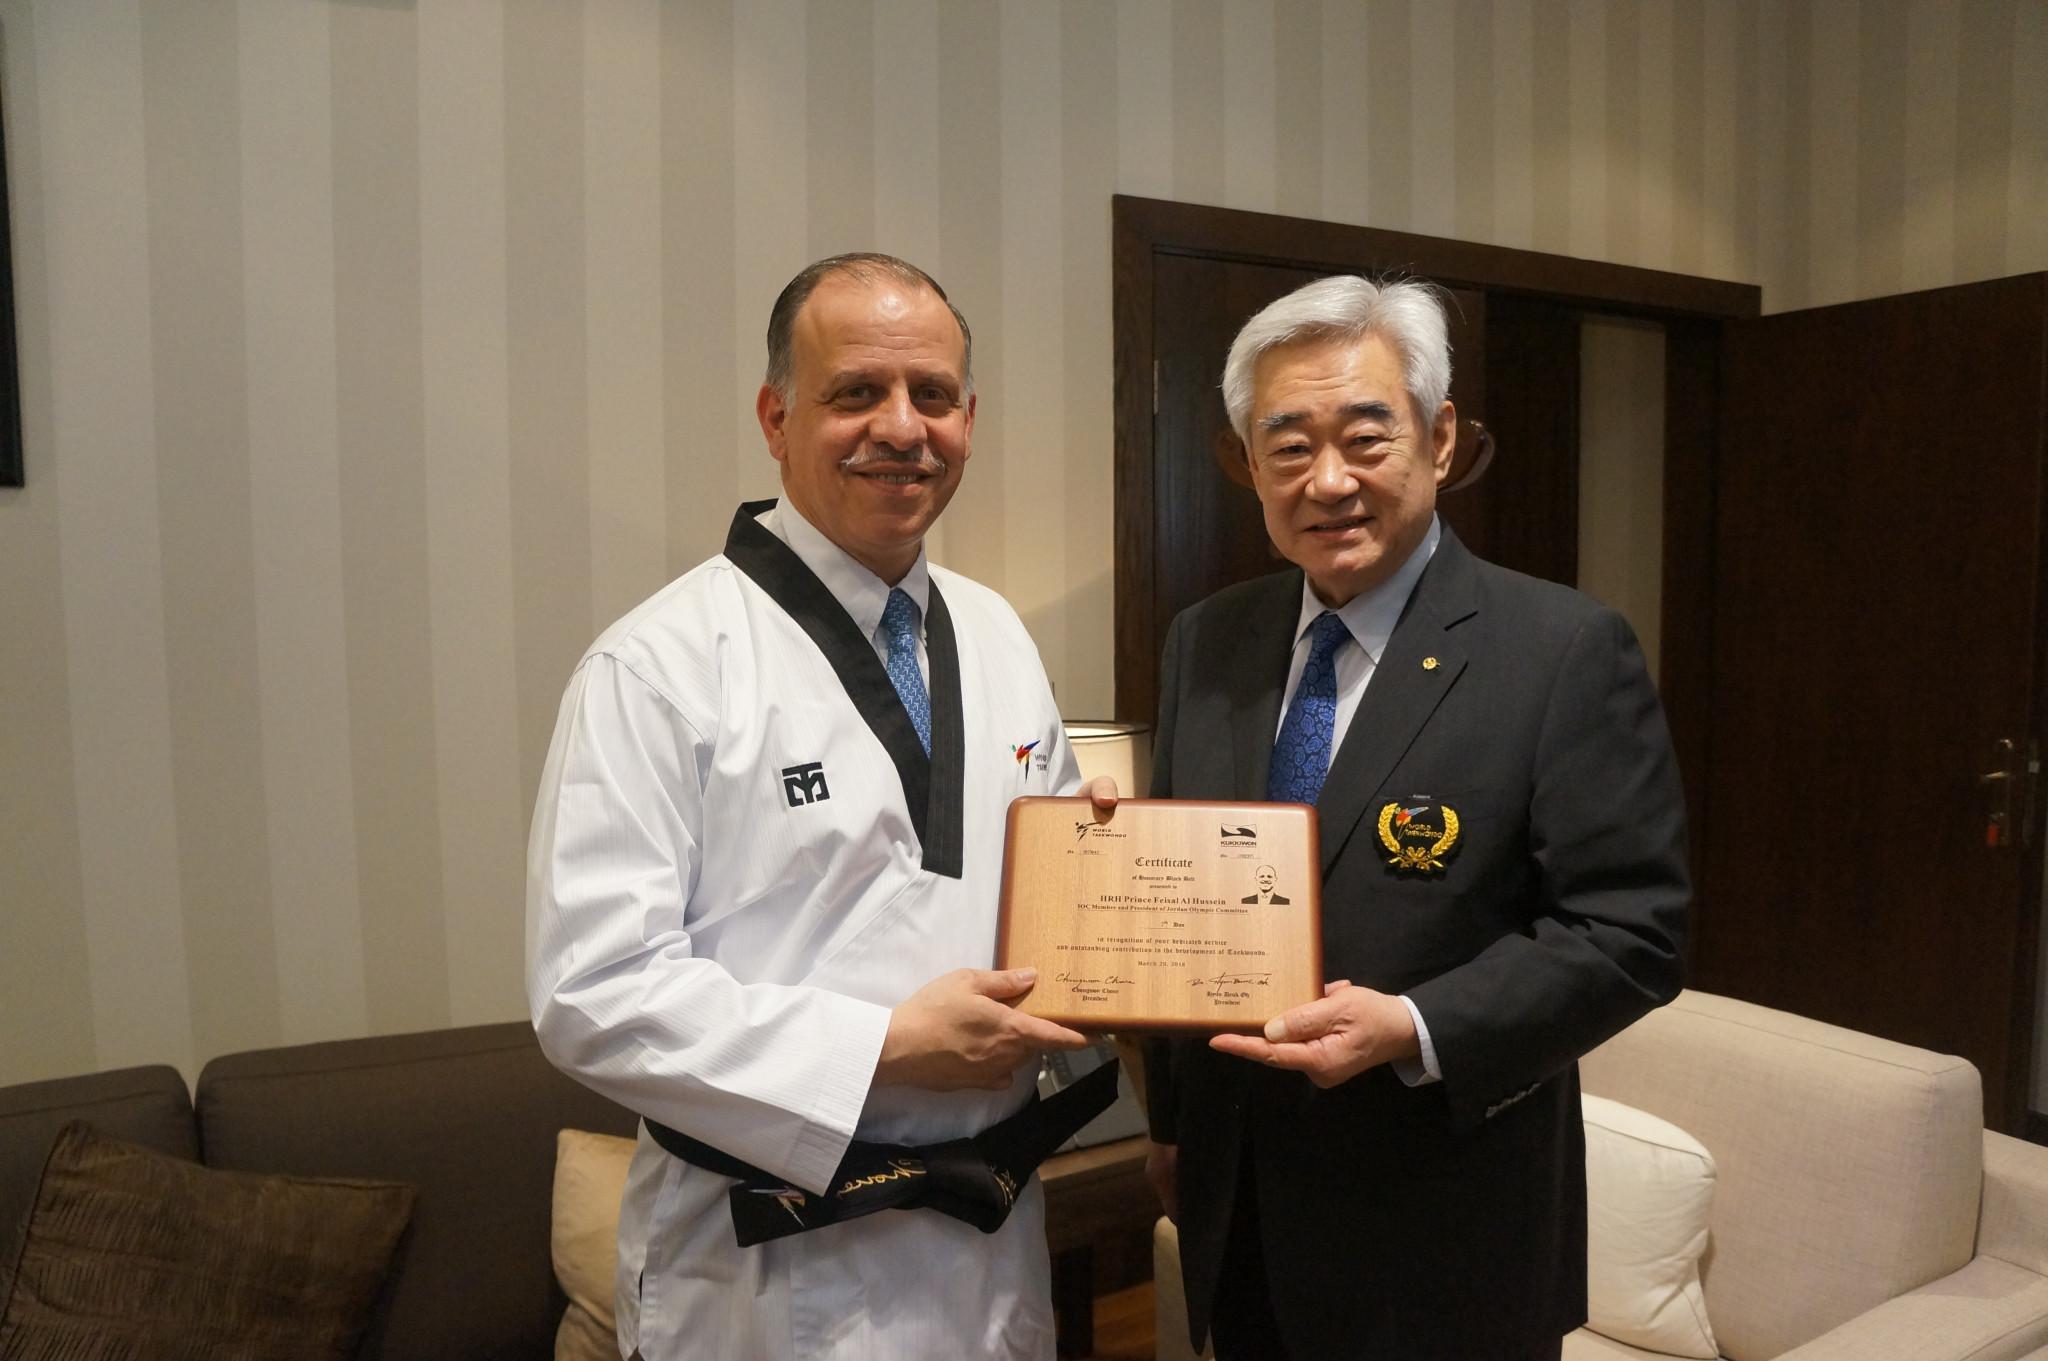 Chungwon Choue presented International Olympic Committee member Prince Feisal Al Hussein with a seventh Dan black belt in Amman ©World Taekwondo